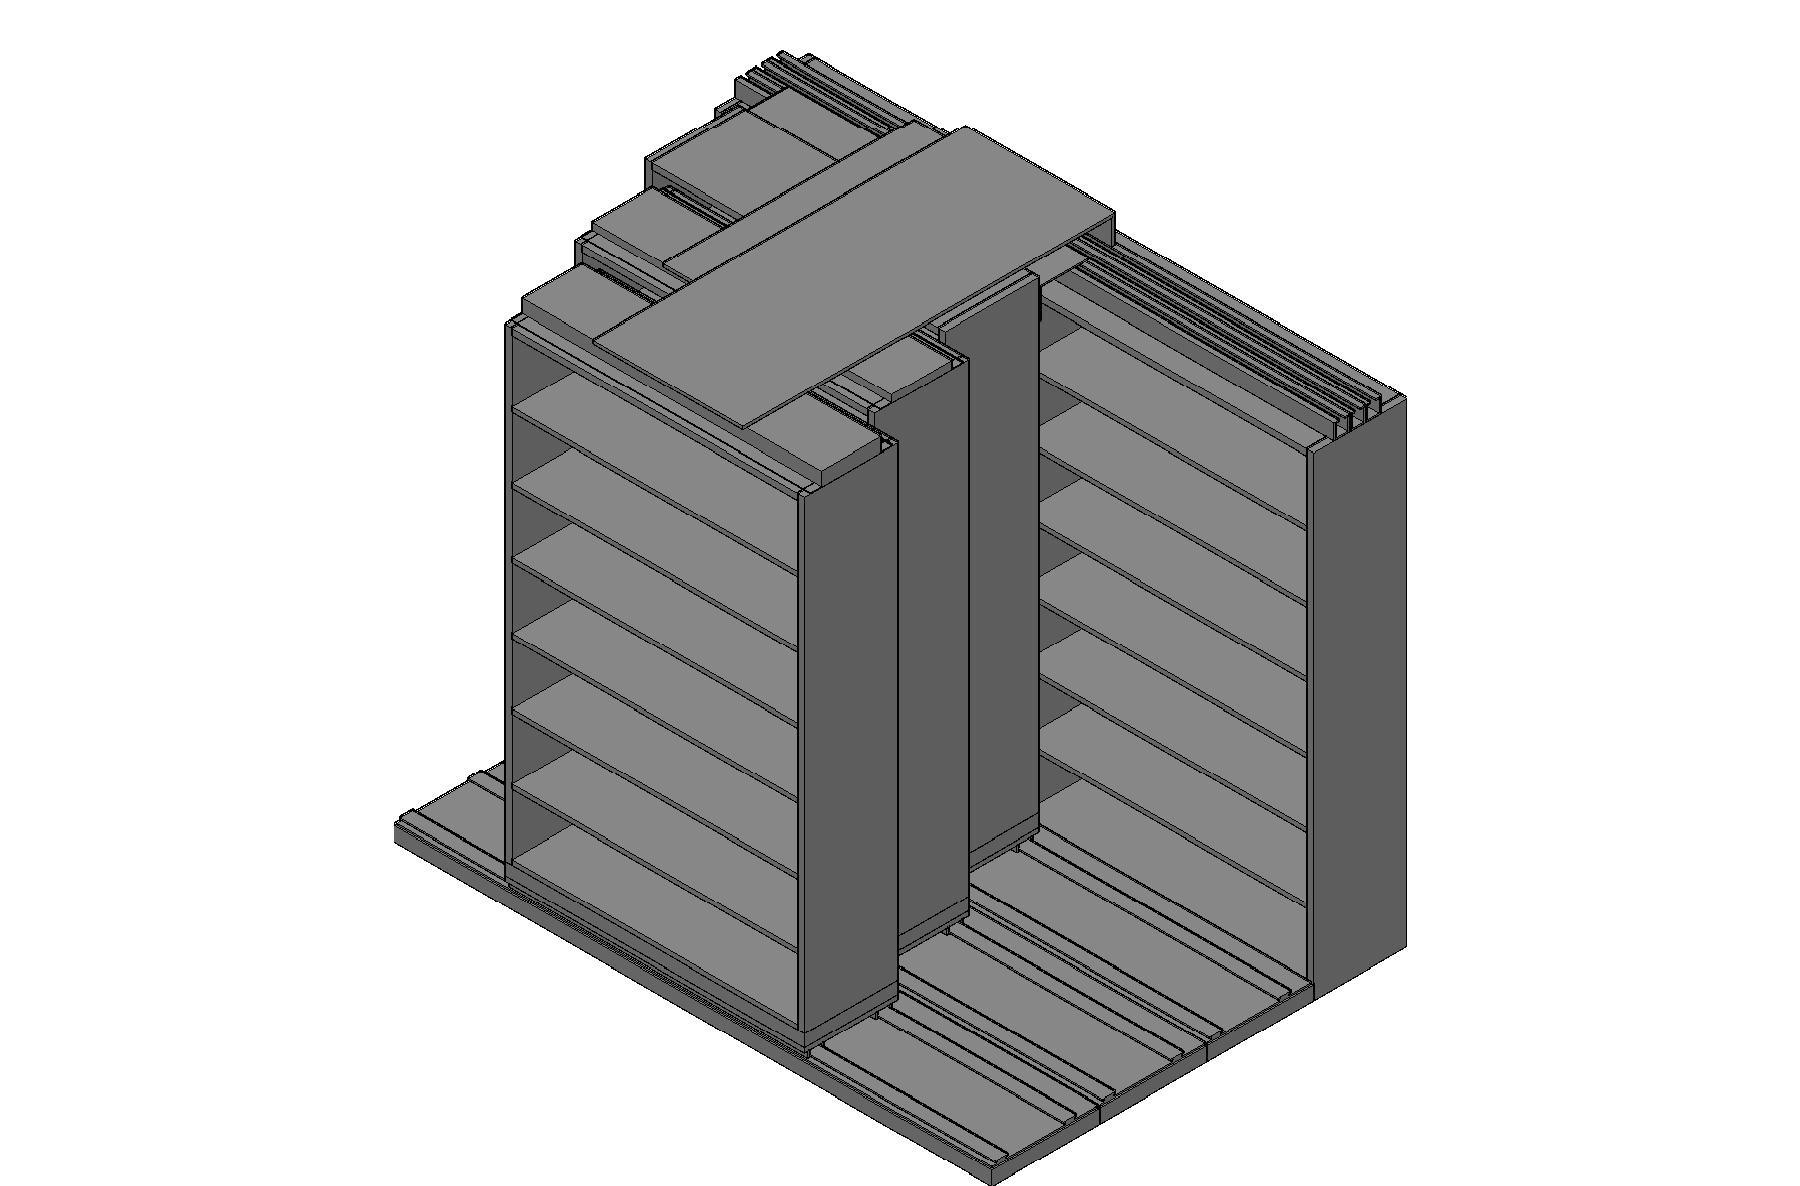 "Legal Size Sliding Shelves - 4 Rows Deep - 7 Levels - (48"" x 15"" Shelves) - 100"" Total Width"